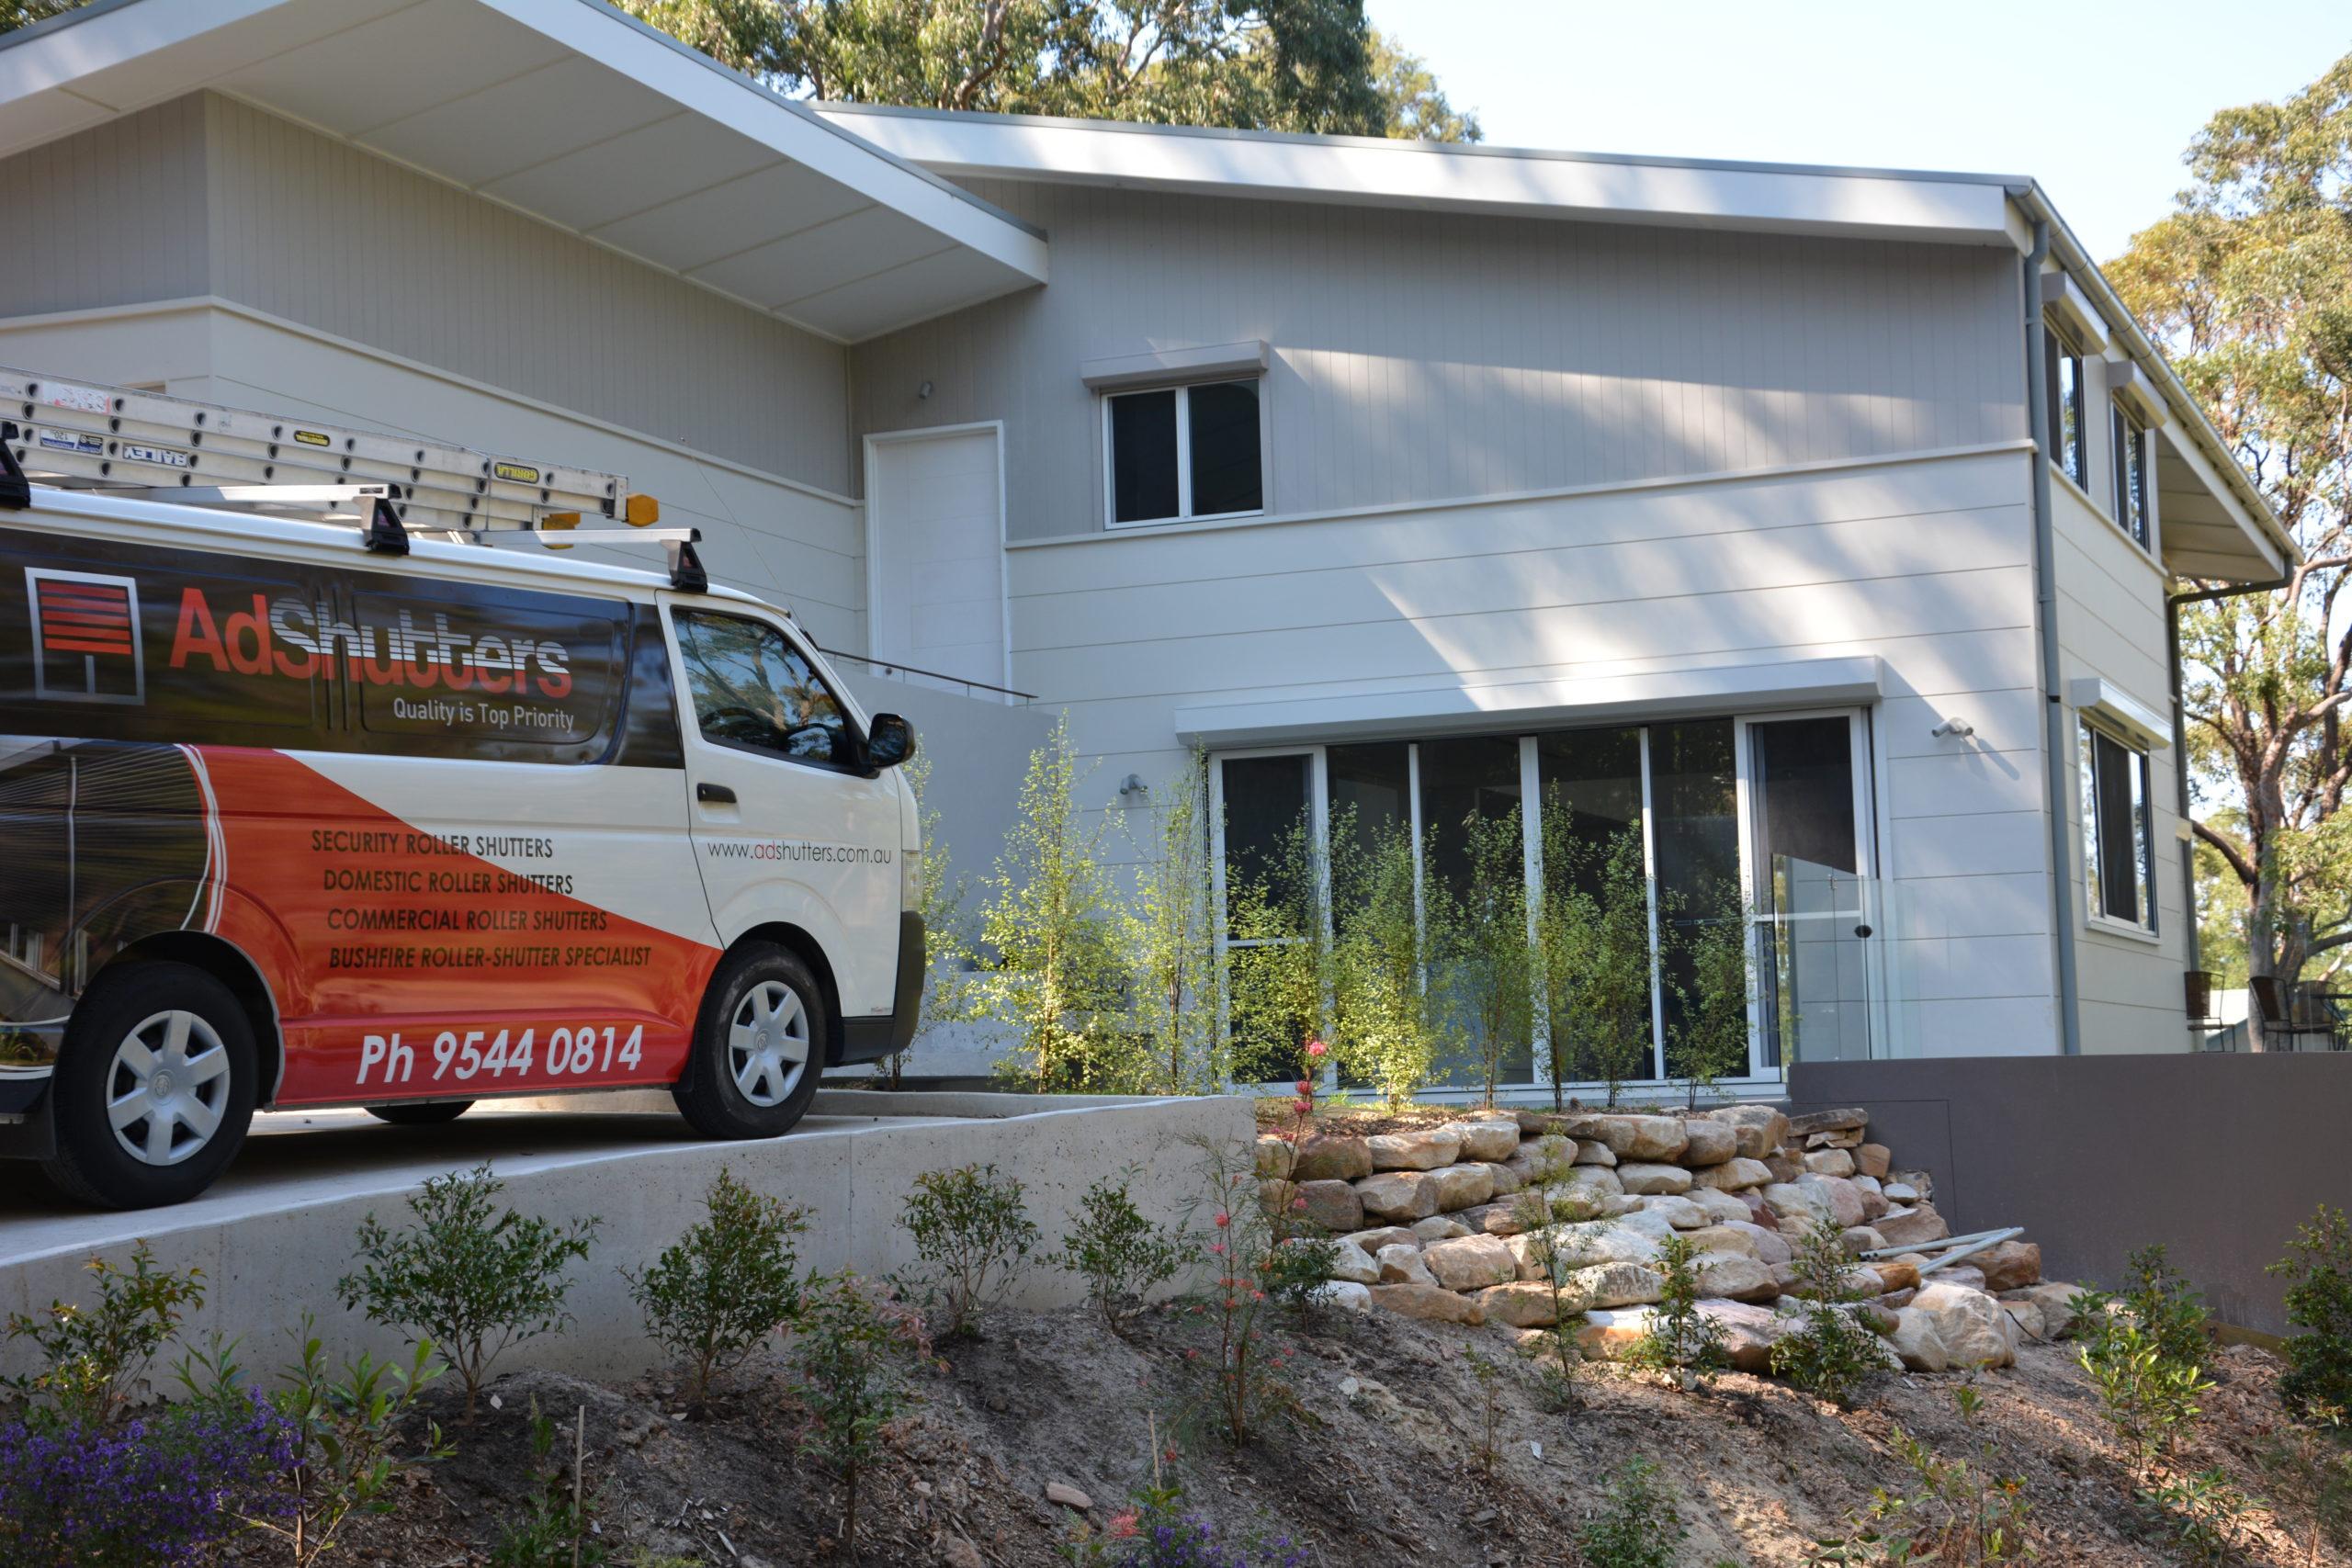 fire rated window shutters sydney nsw